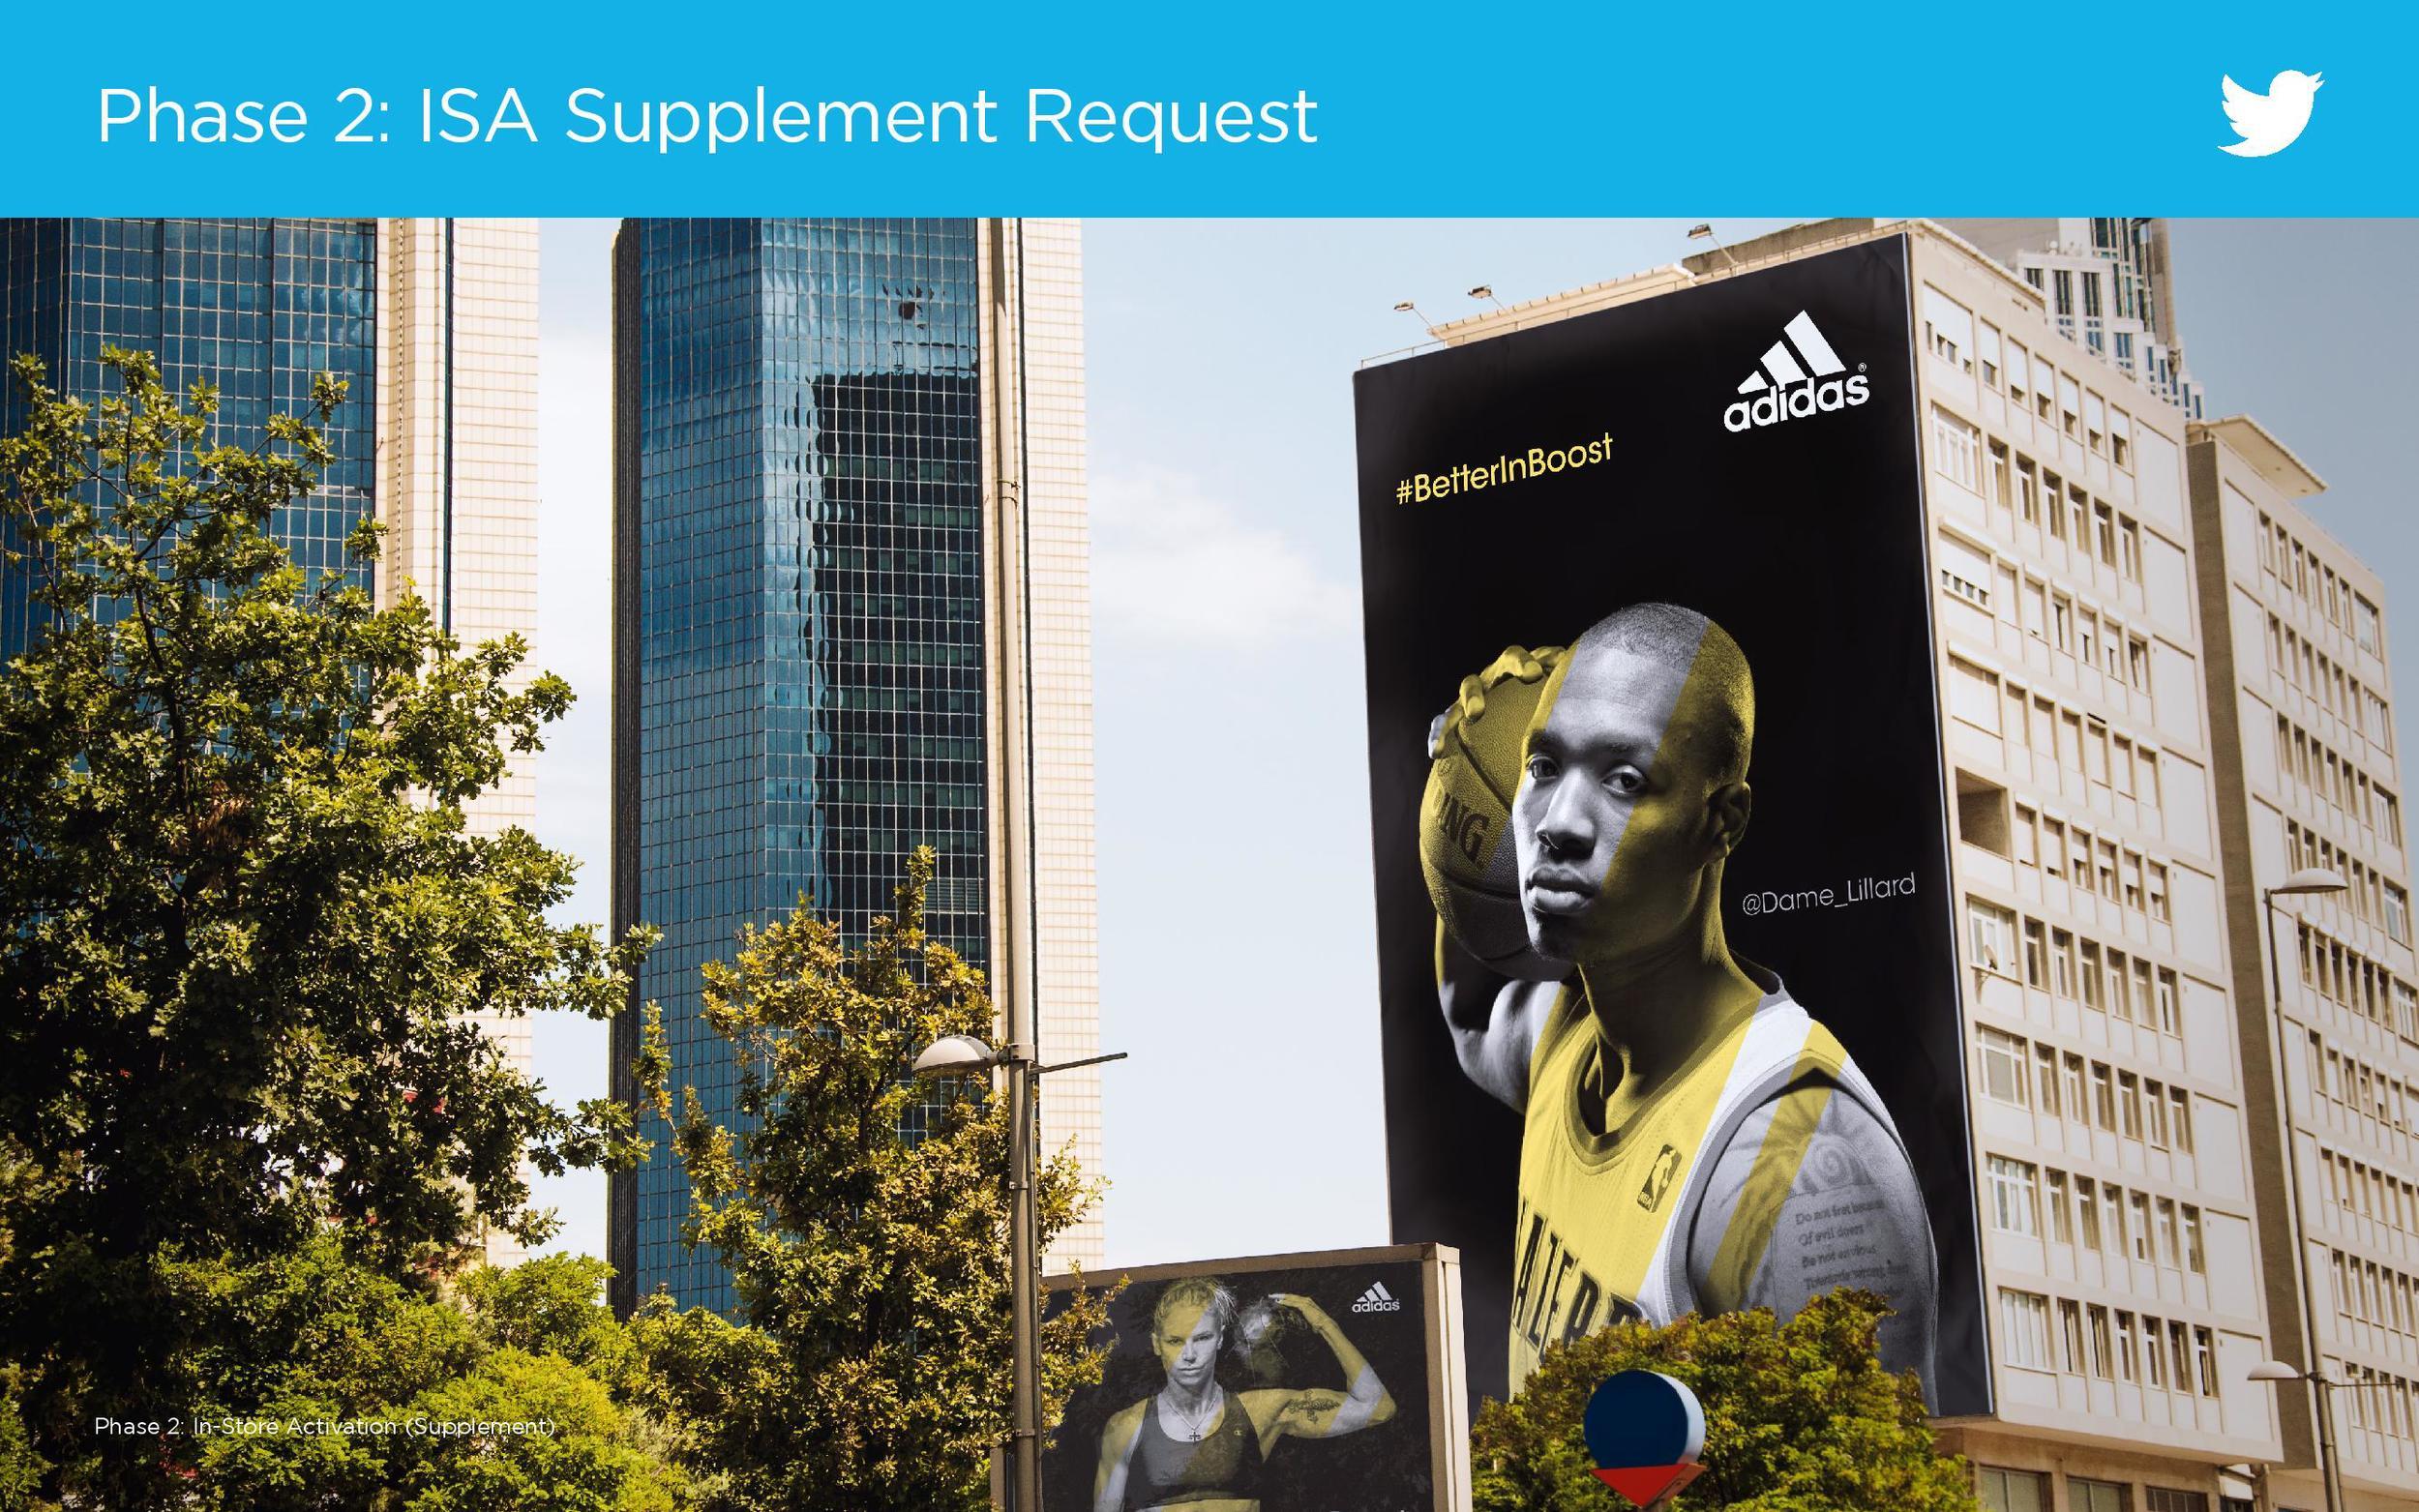 Adidas_Boost_Presentation_TP_Supp-page-011.jpg